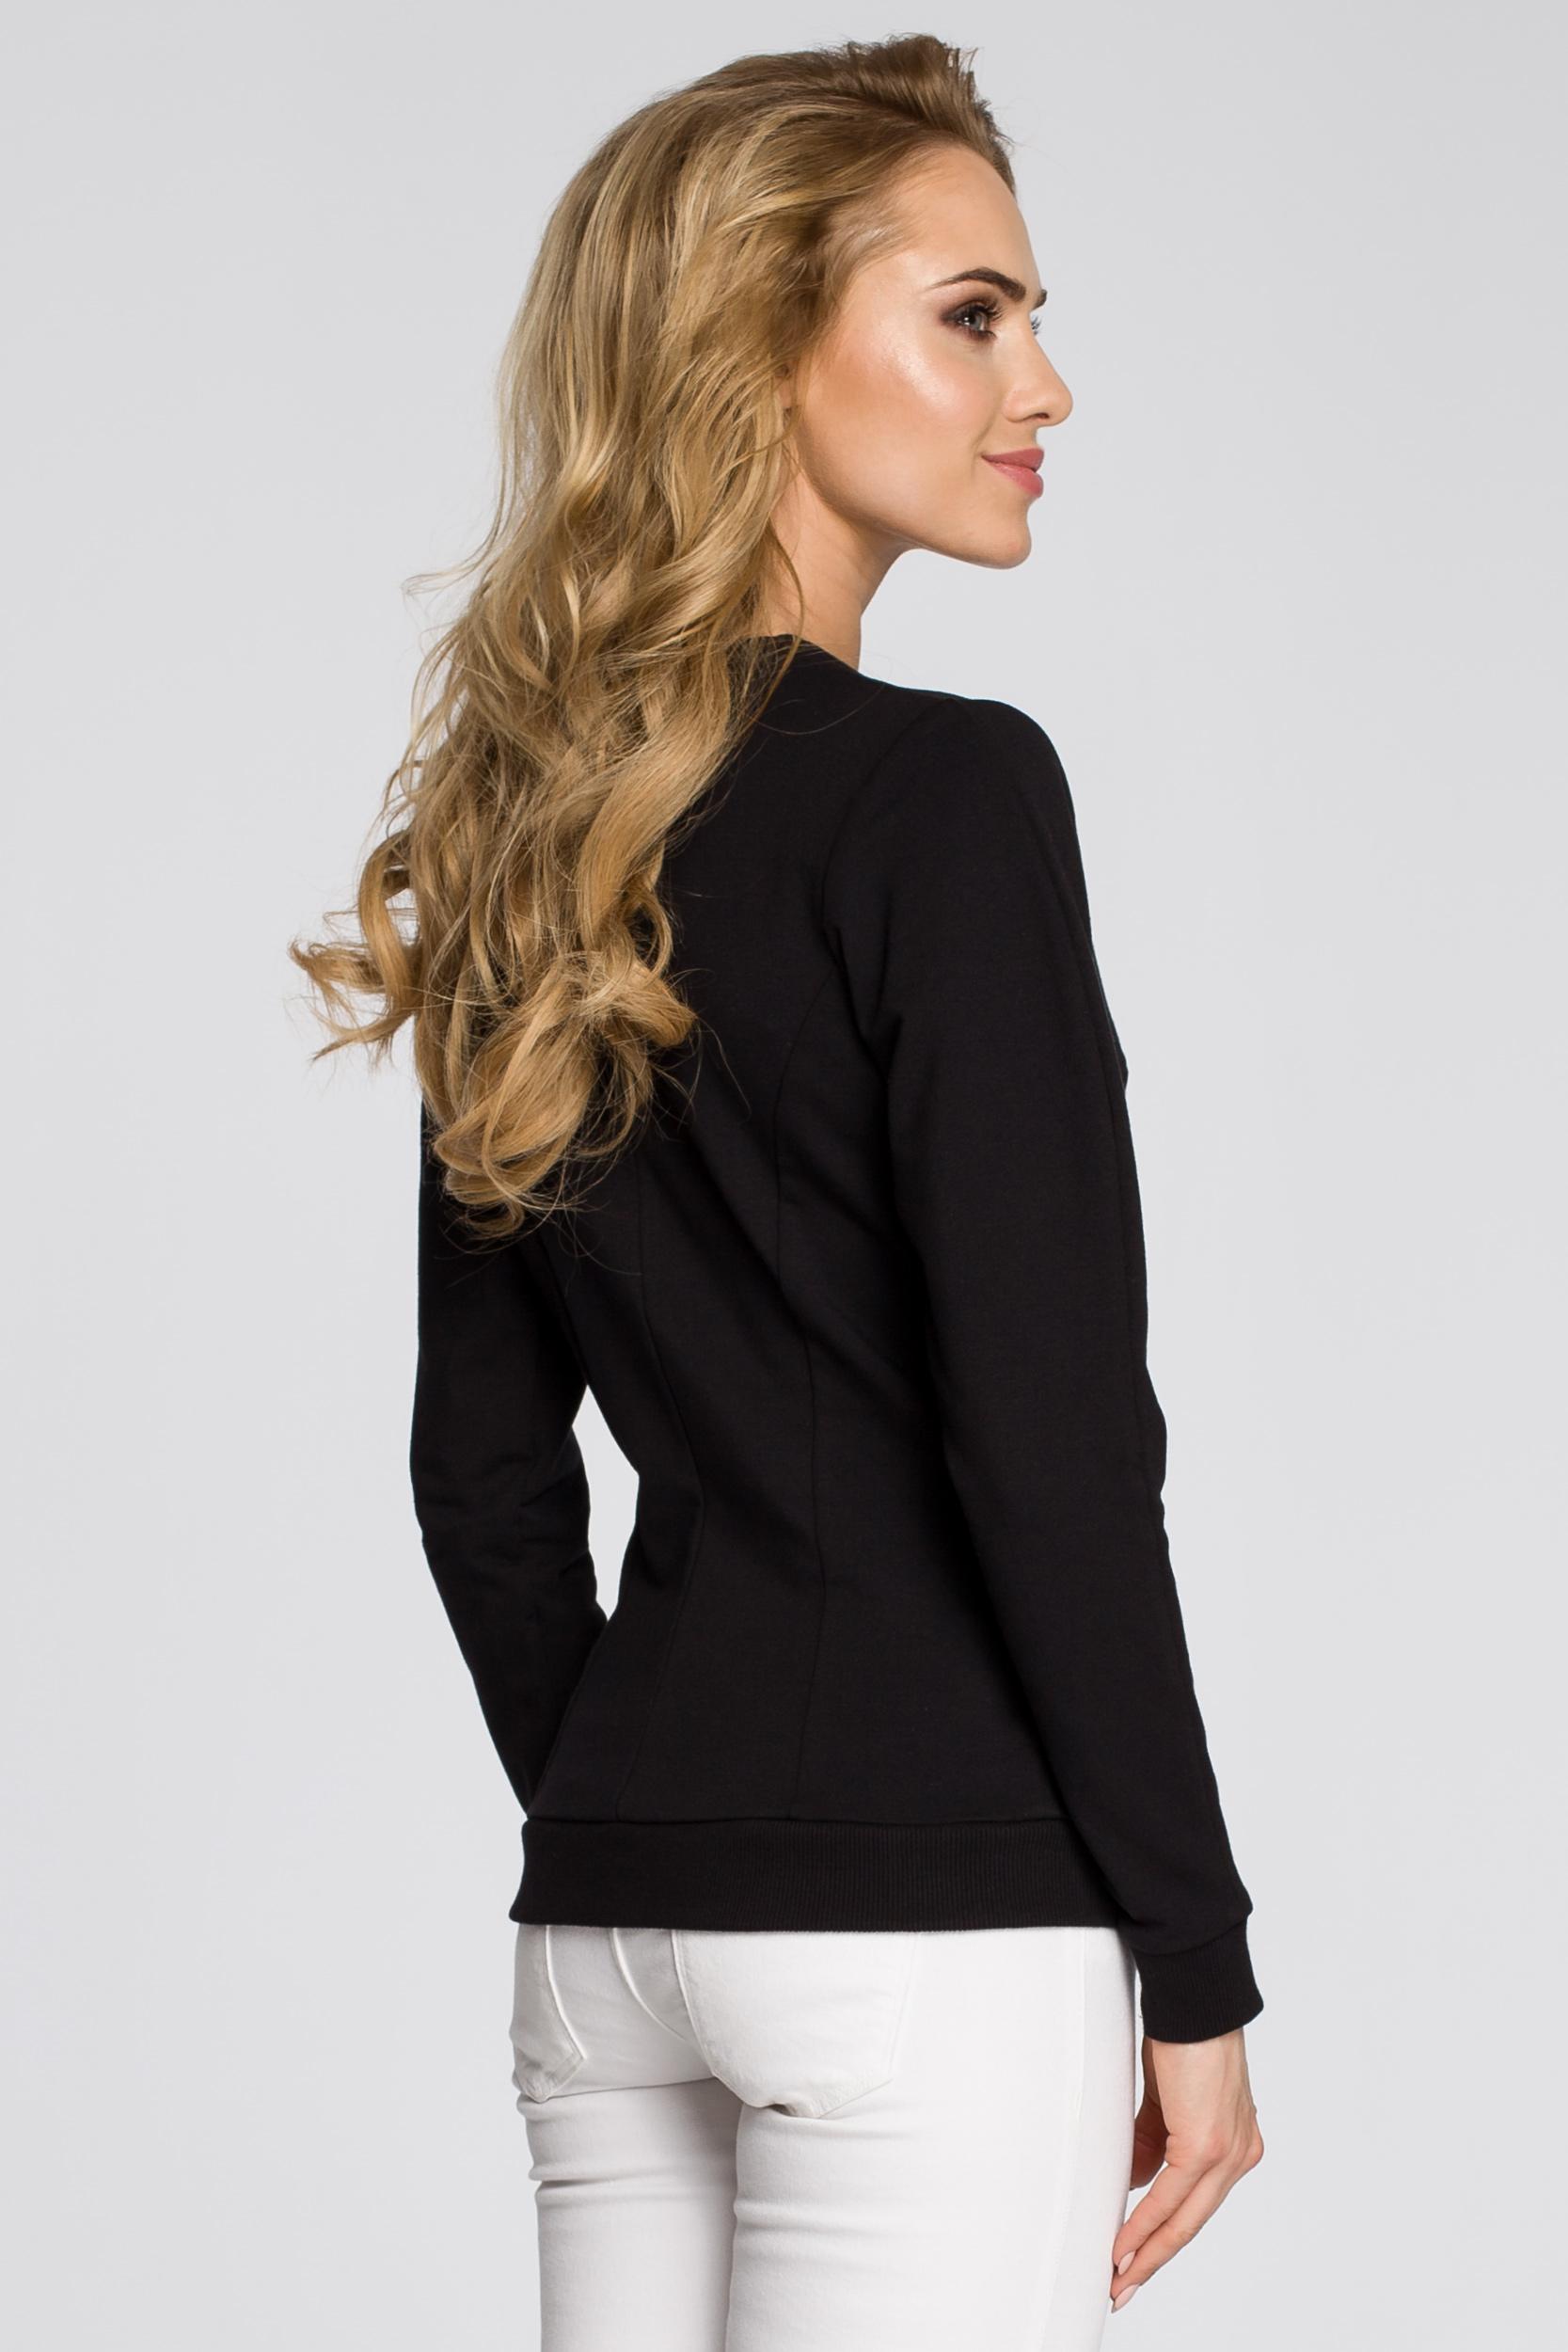 CM2455 Dresowa kurtka zasuwana na zamek - czarna